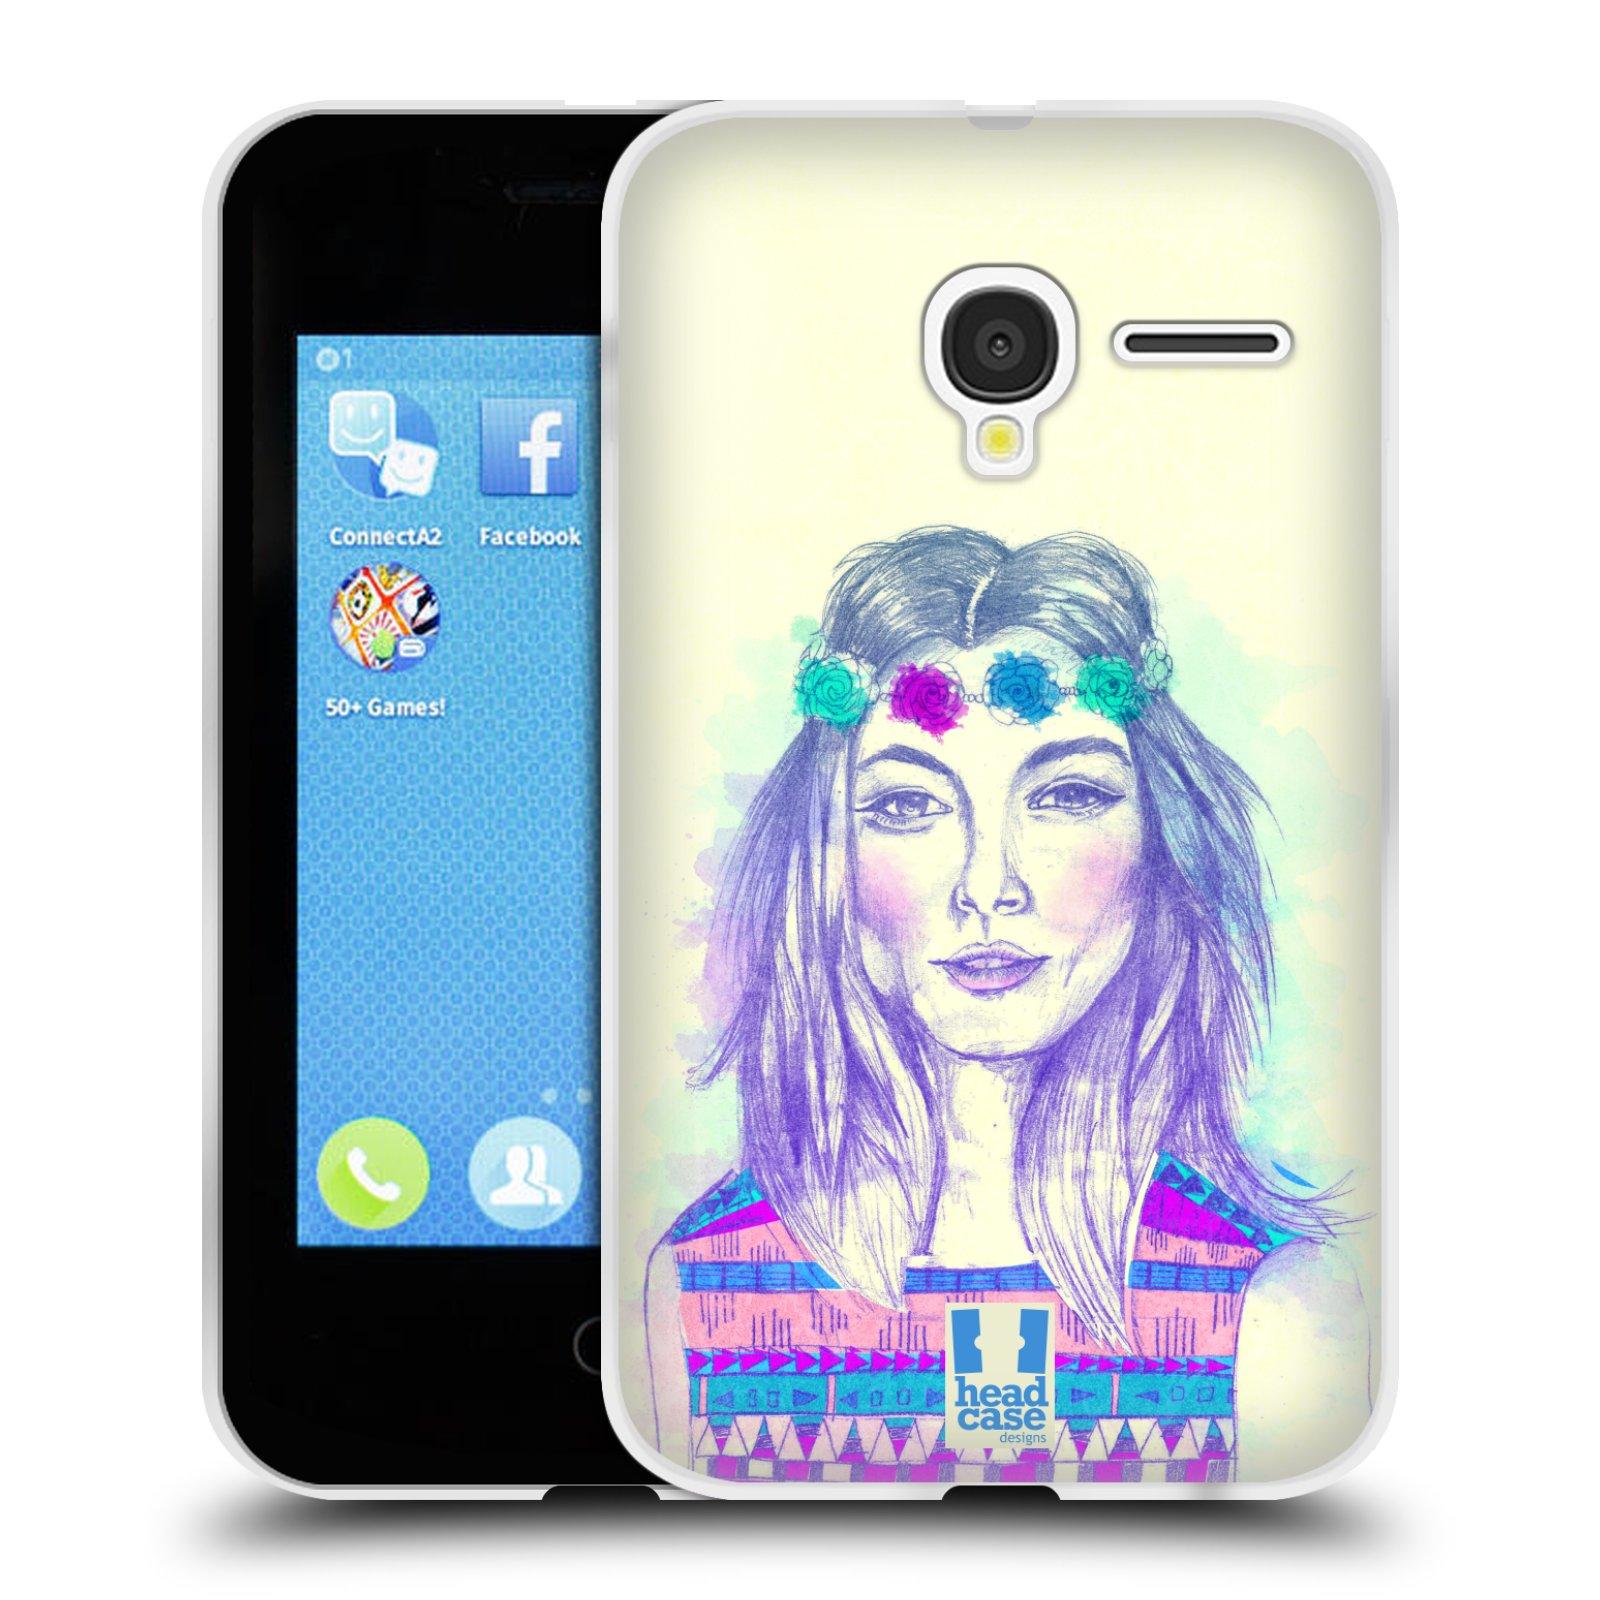 HEAD CASE silikonový obal na mobil Alcatel PIXI 3 OT-4022D (3,5 palcový displej) vzor Dívka dlouhé květinové vlasy HIPPIE modrá